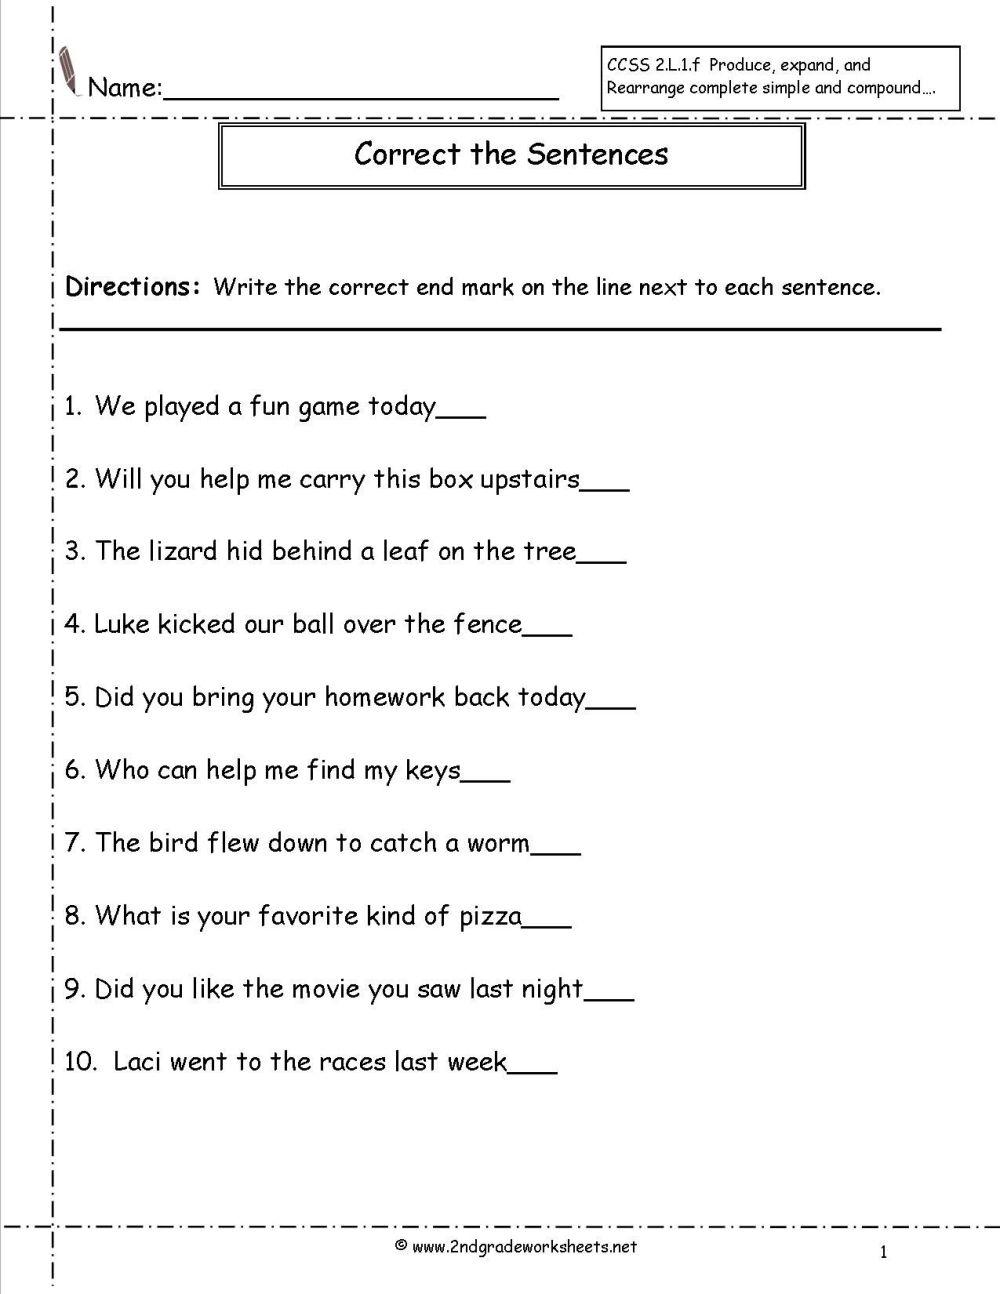 medium resolution of Finding Onomatopoeia Worksheet   Ks3 English Worksheets